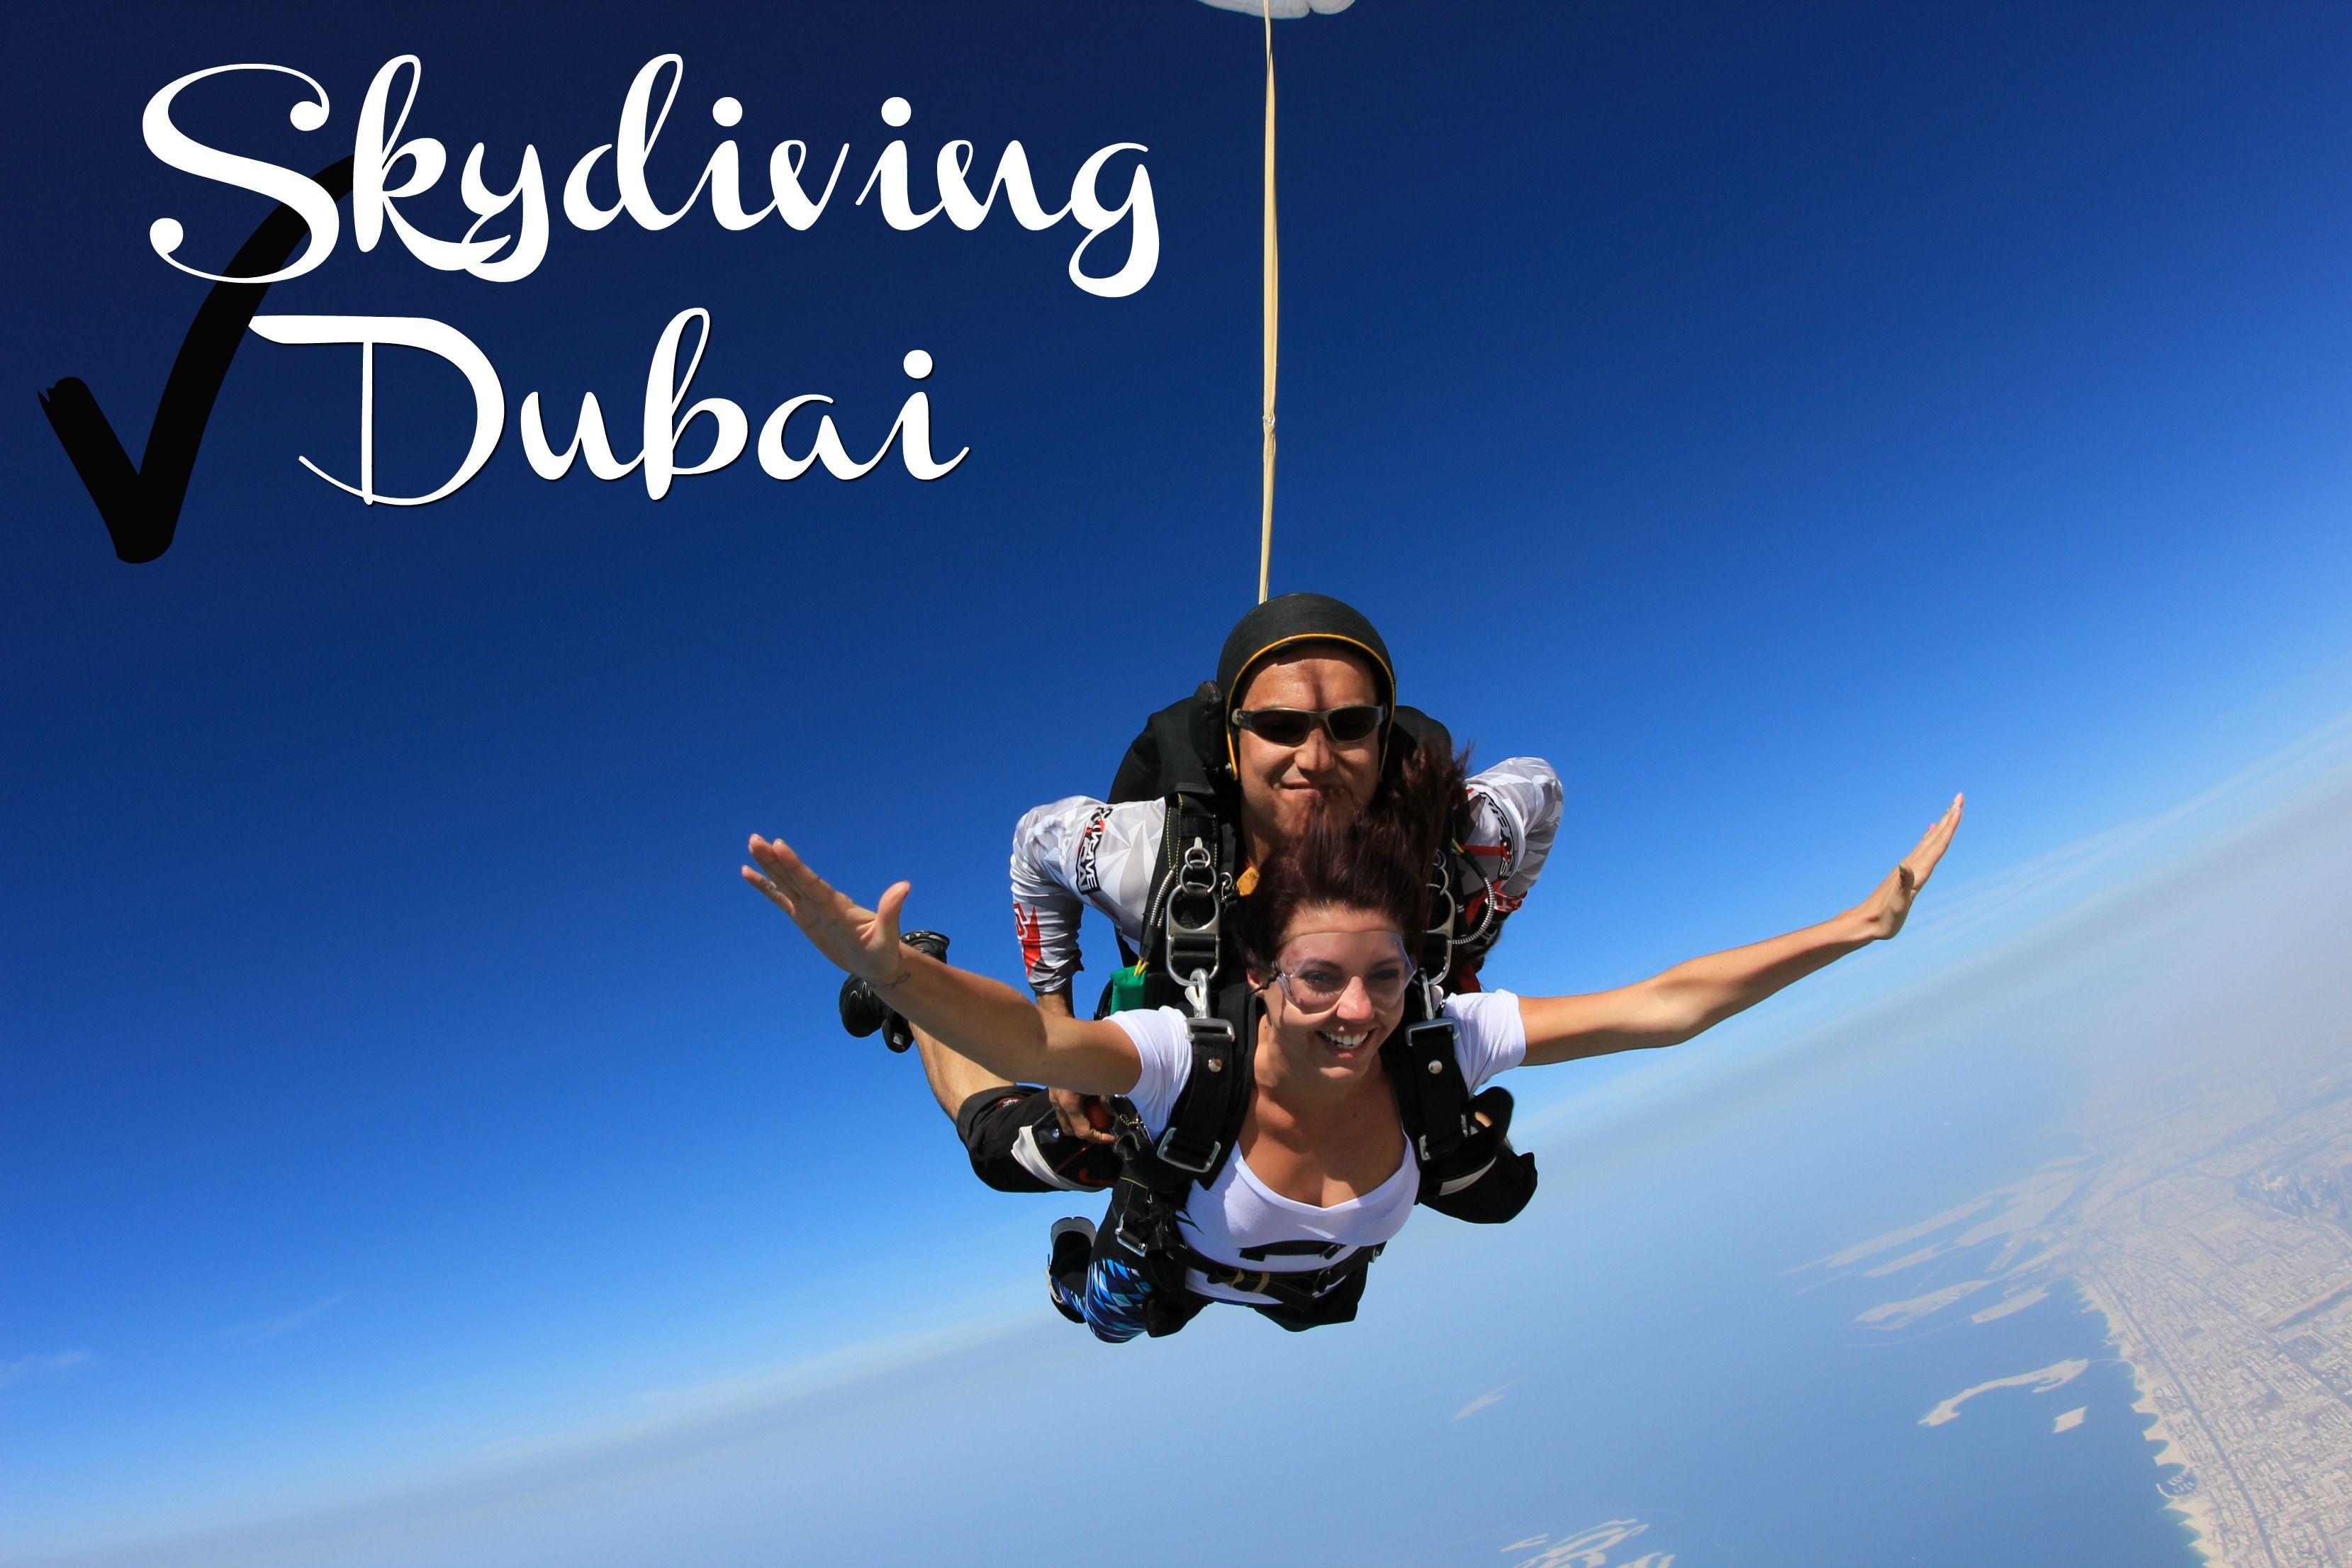 Bluehost Com Skydiving In Dubai Dubai Travel Dubai